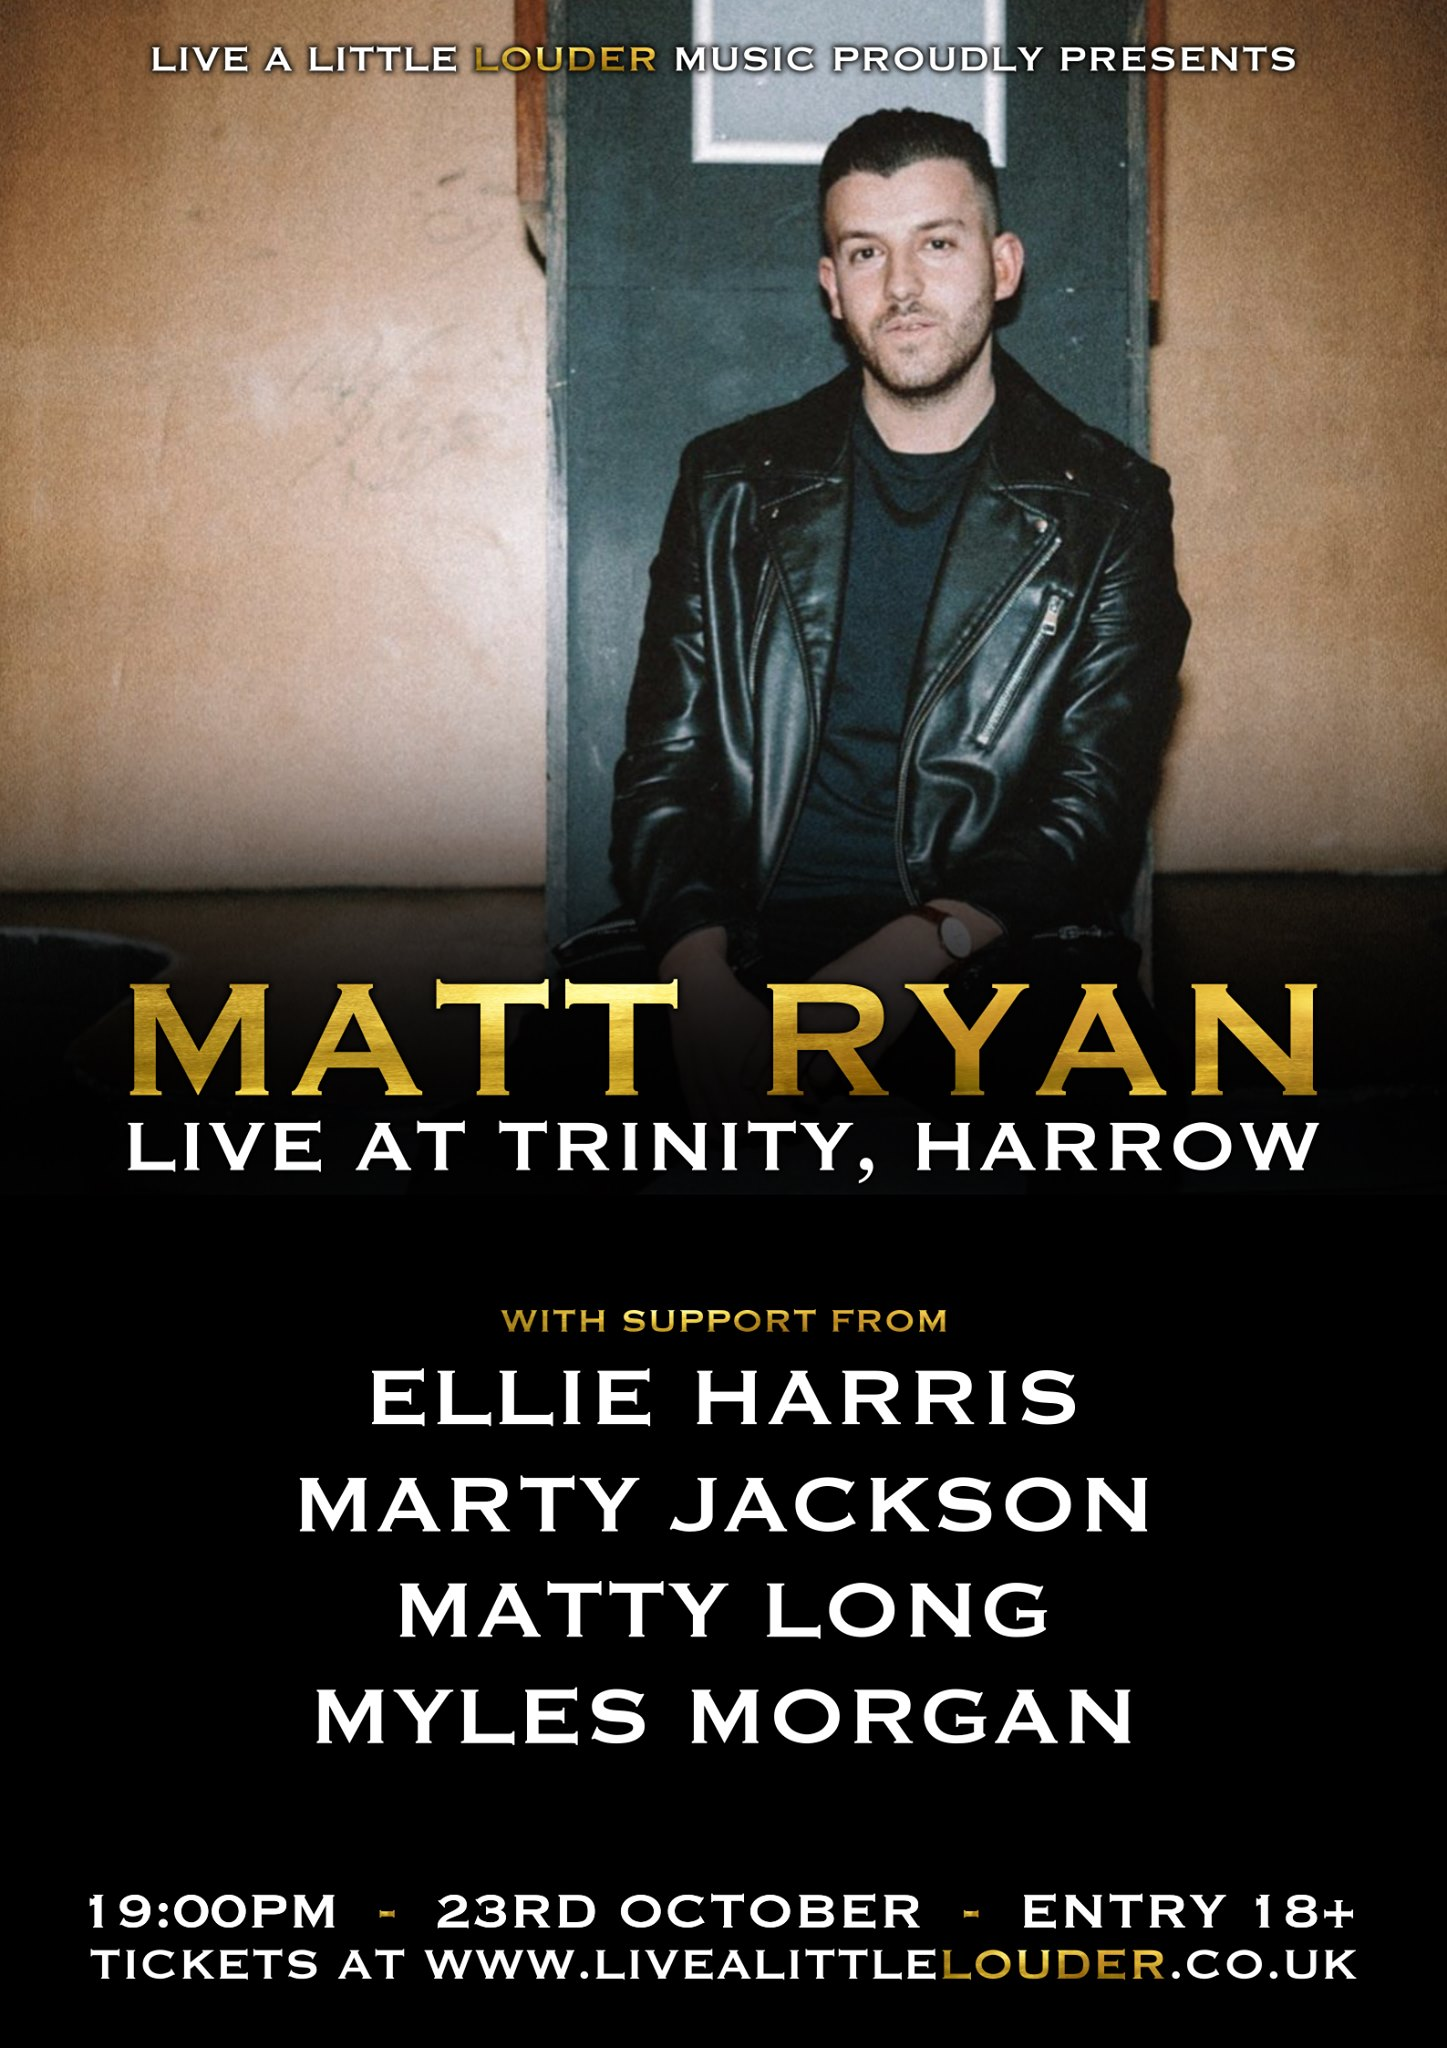 Matt Ryan//Marty Jackson//Ellie Harris//Matty Long//Myles Morgan